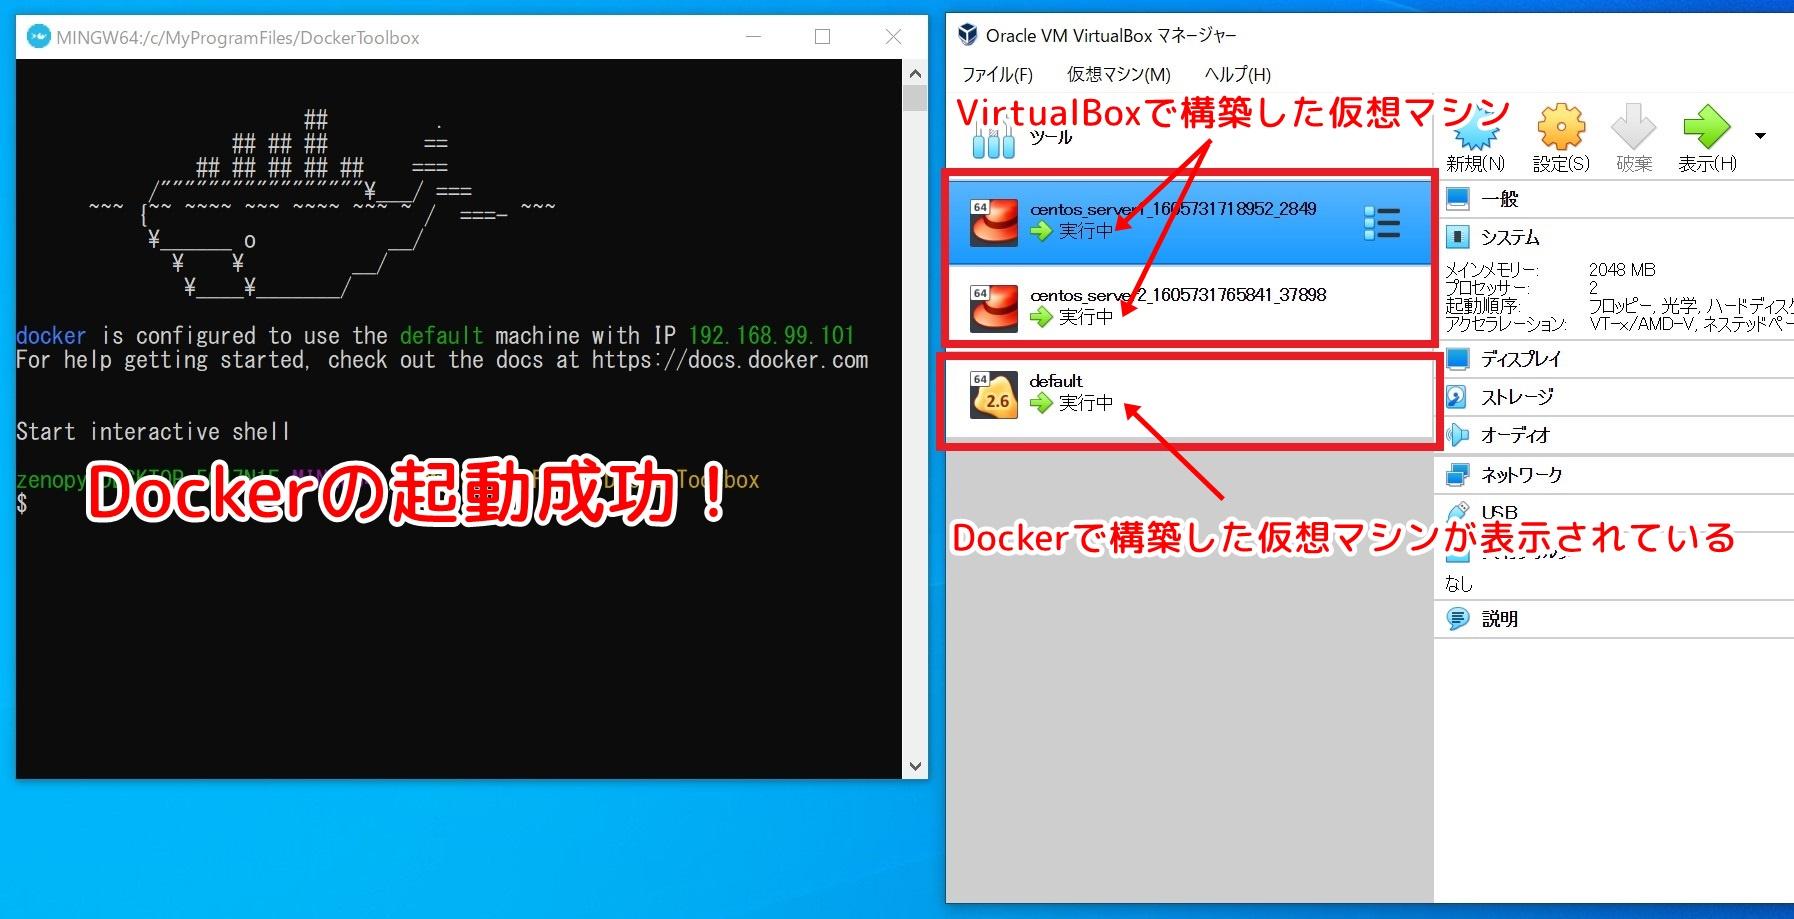 VirtualBoxとDockerを共存させる方法